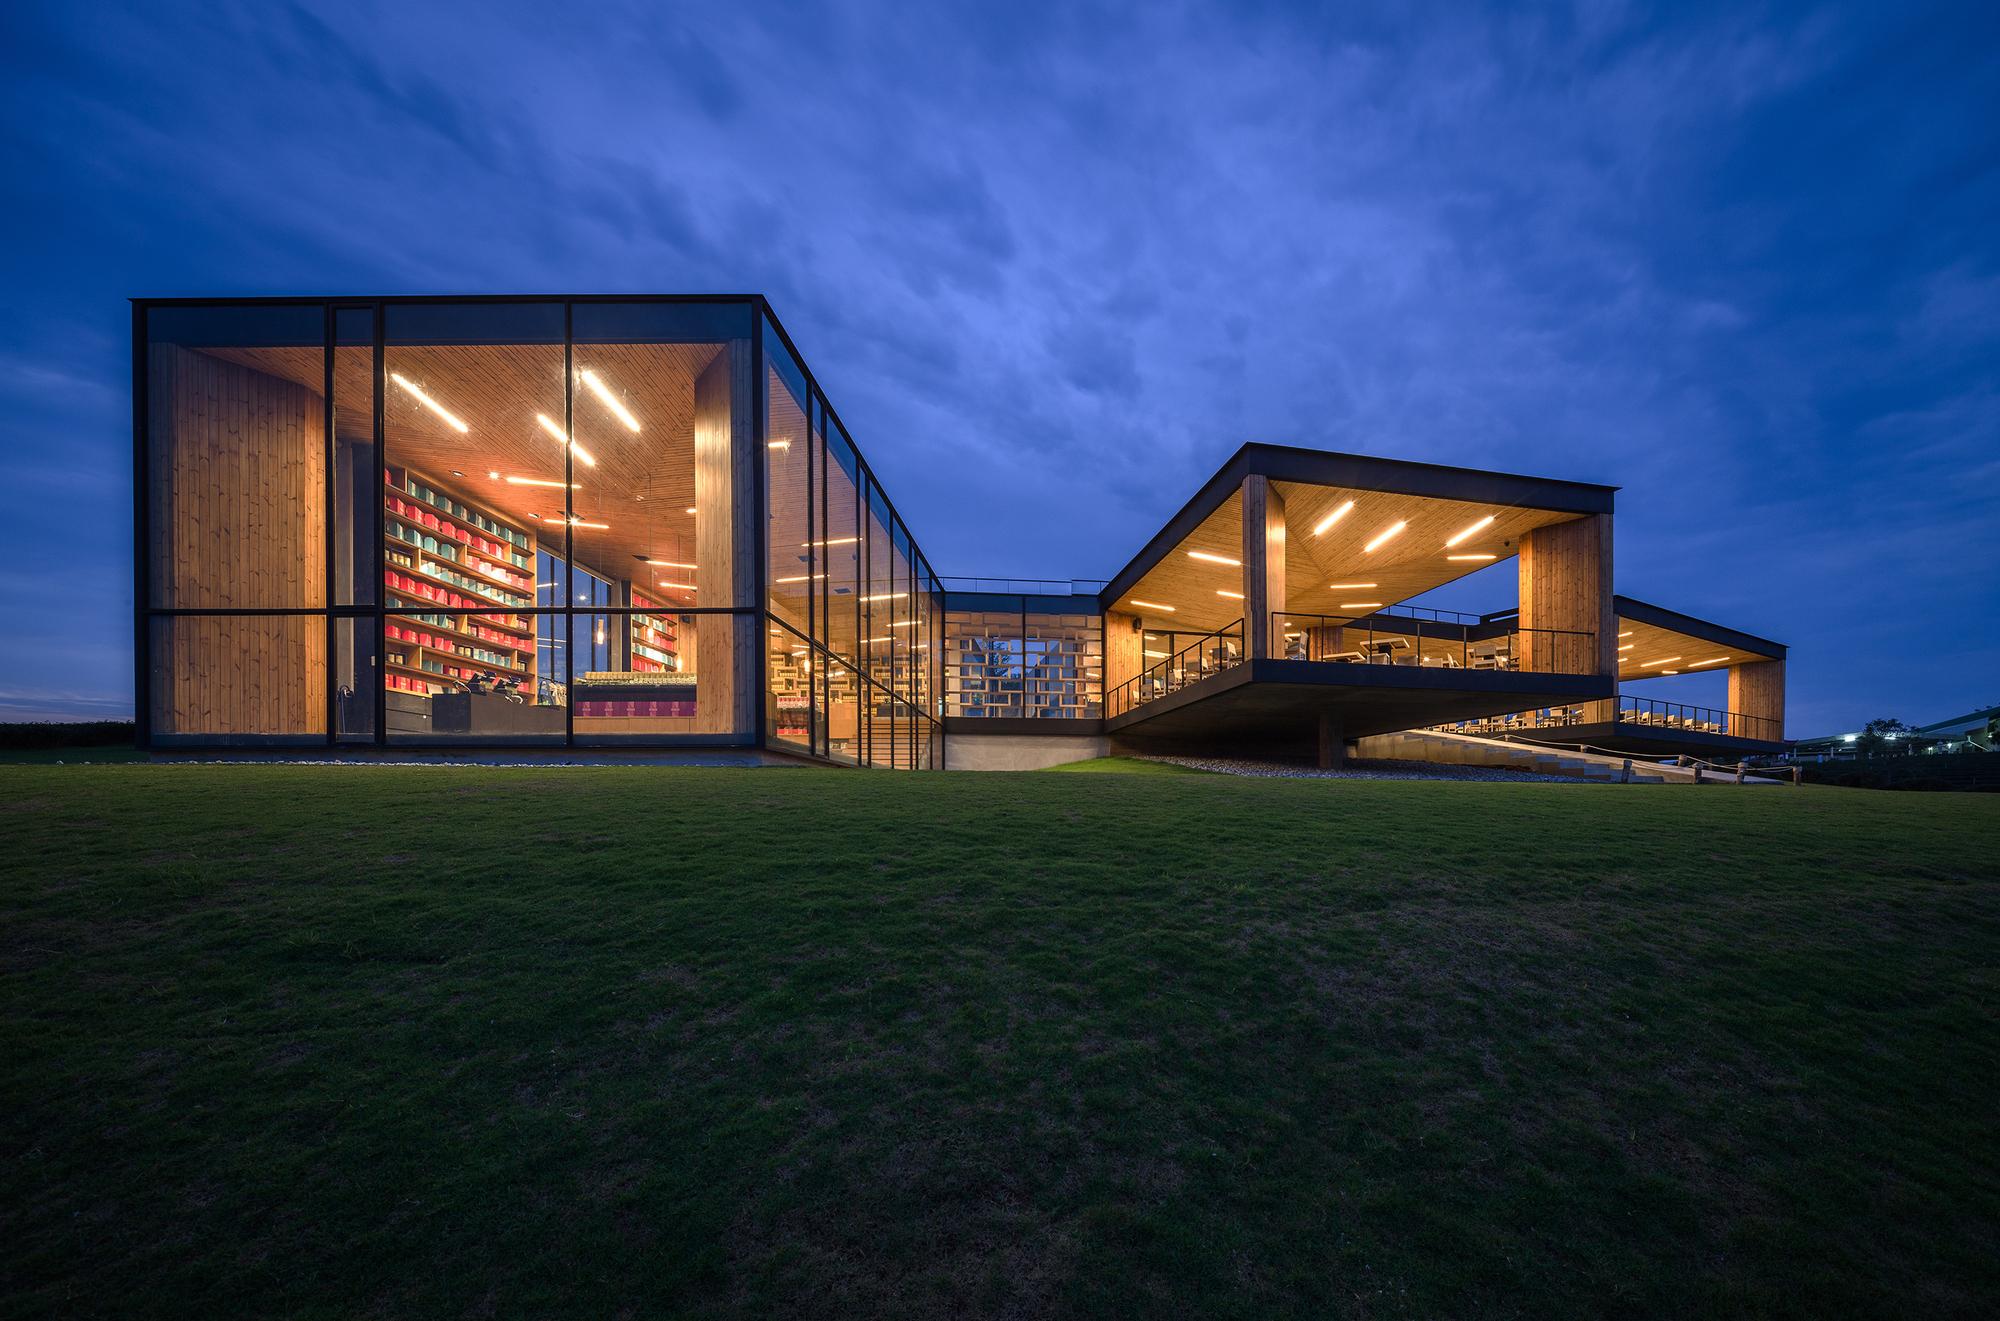 Choui Fong Tea Cafe / IDIN Architects